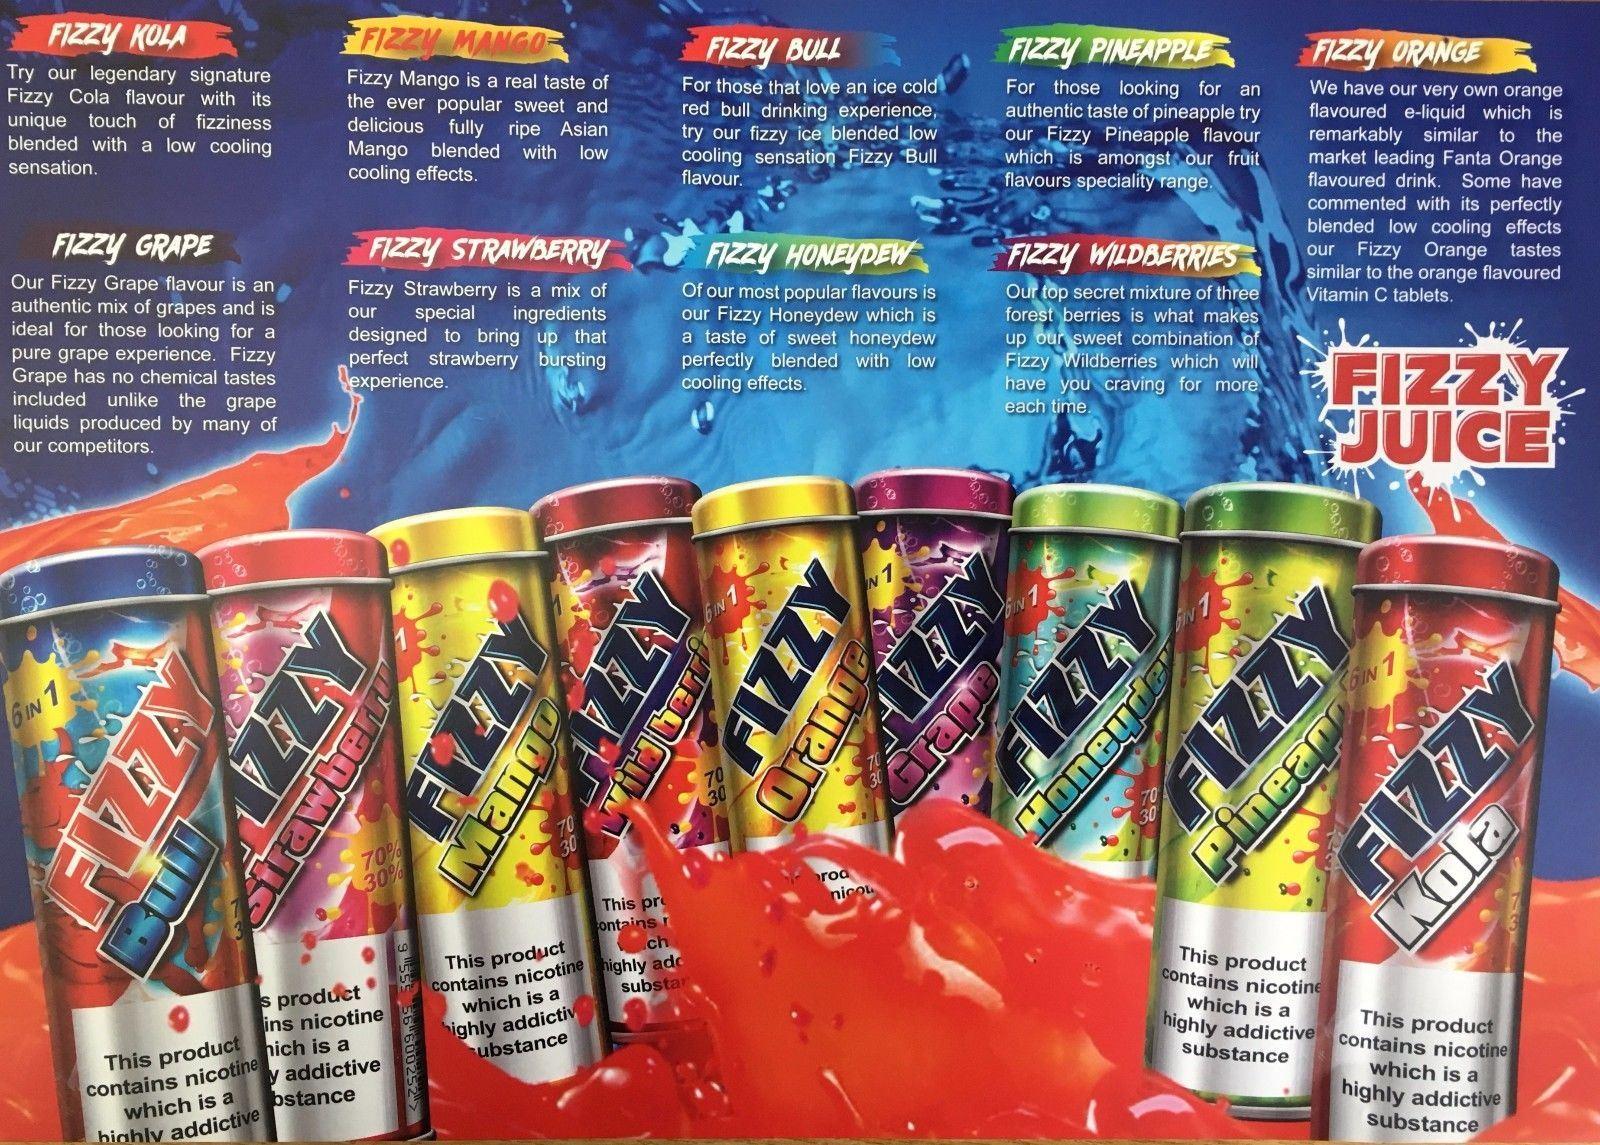 Fizzy Juice 60ml (6x10ml) – £11.40 at Vape Potions